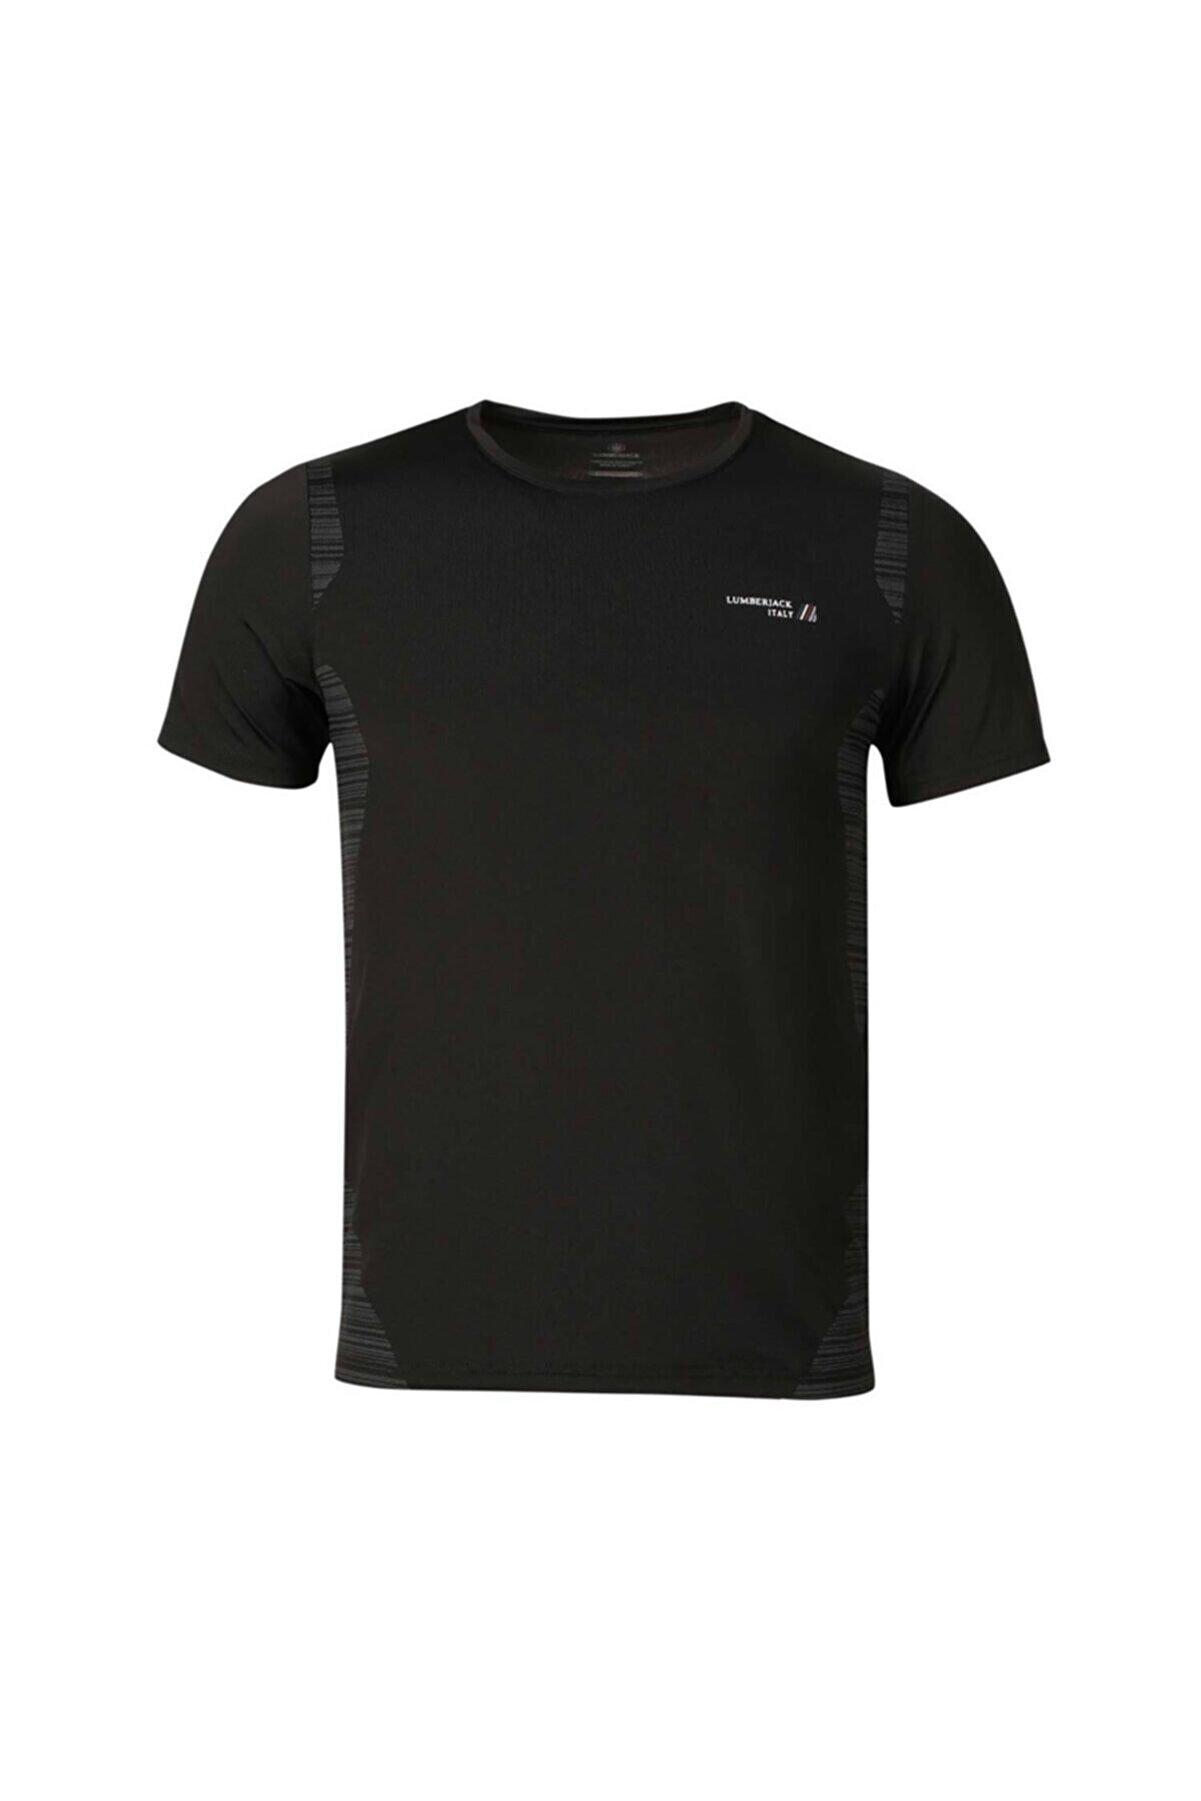 Lumberjack CT452 DALE T-SHIRT Siyah Erkek T-Shirt 100582756